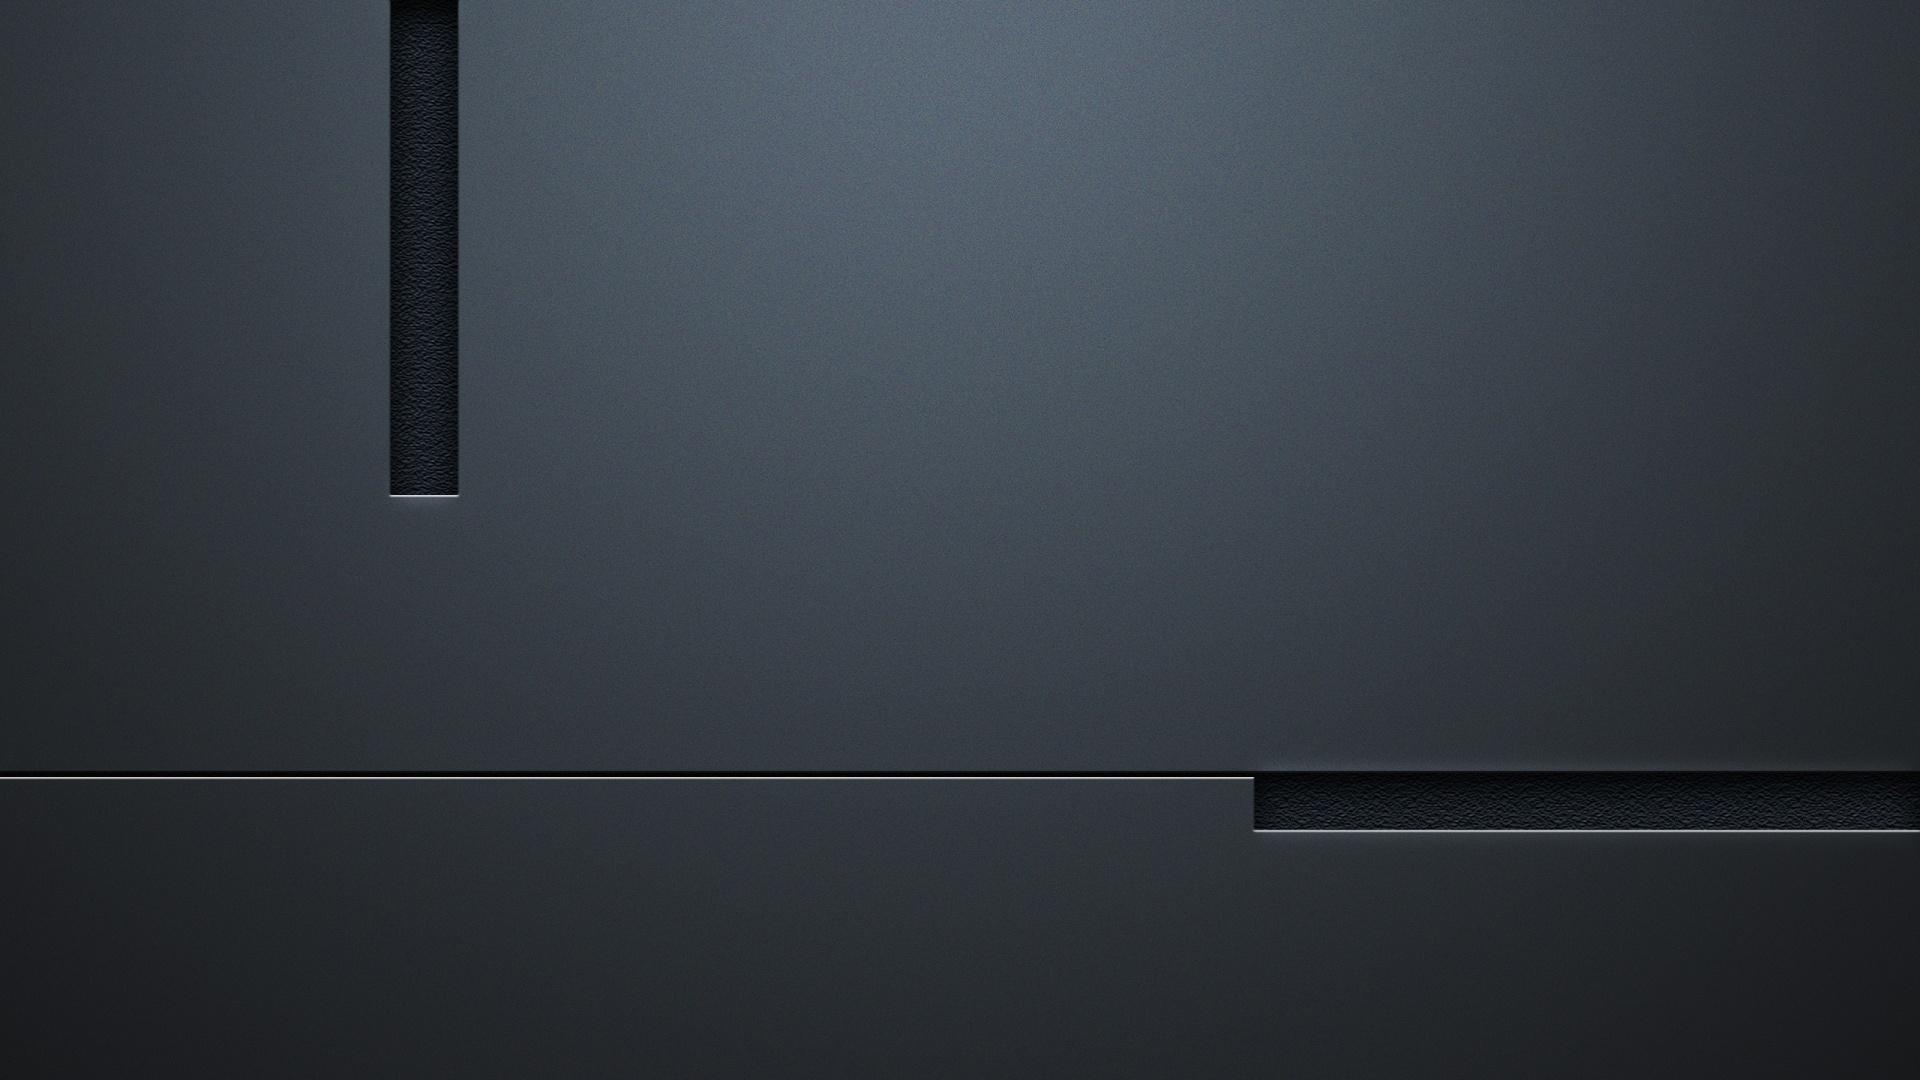 Free Download Gray Desktop Wallpaper Images Pictures Becuo 1920x1080 For Your Desktop Mobile Tablet Explore 50 Gray Desktop Wallpaper Gray Background Wallpaper Gray Hd Wallpaper Black And Grey Desktop Wallpaper